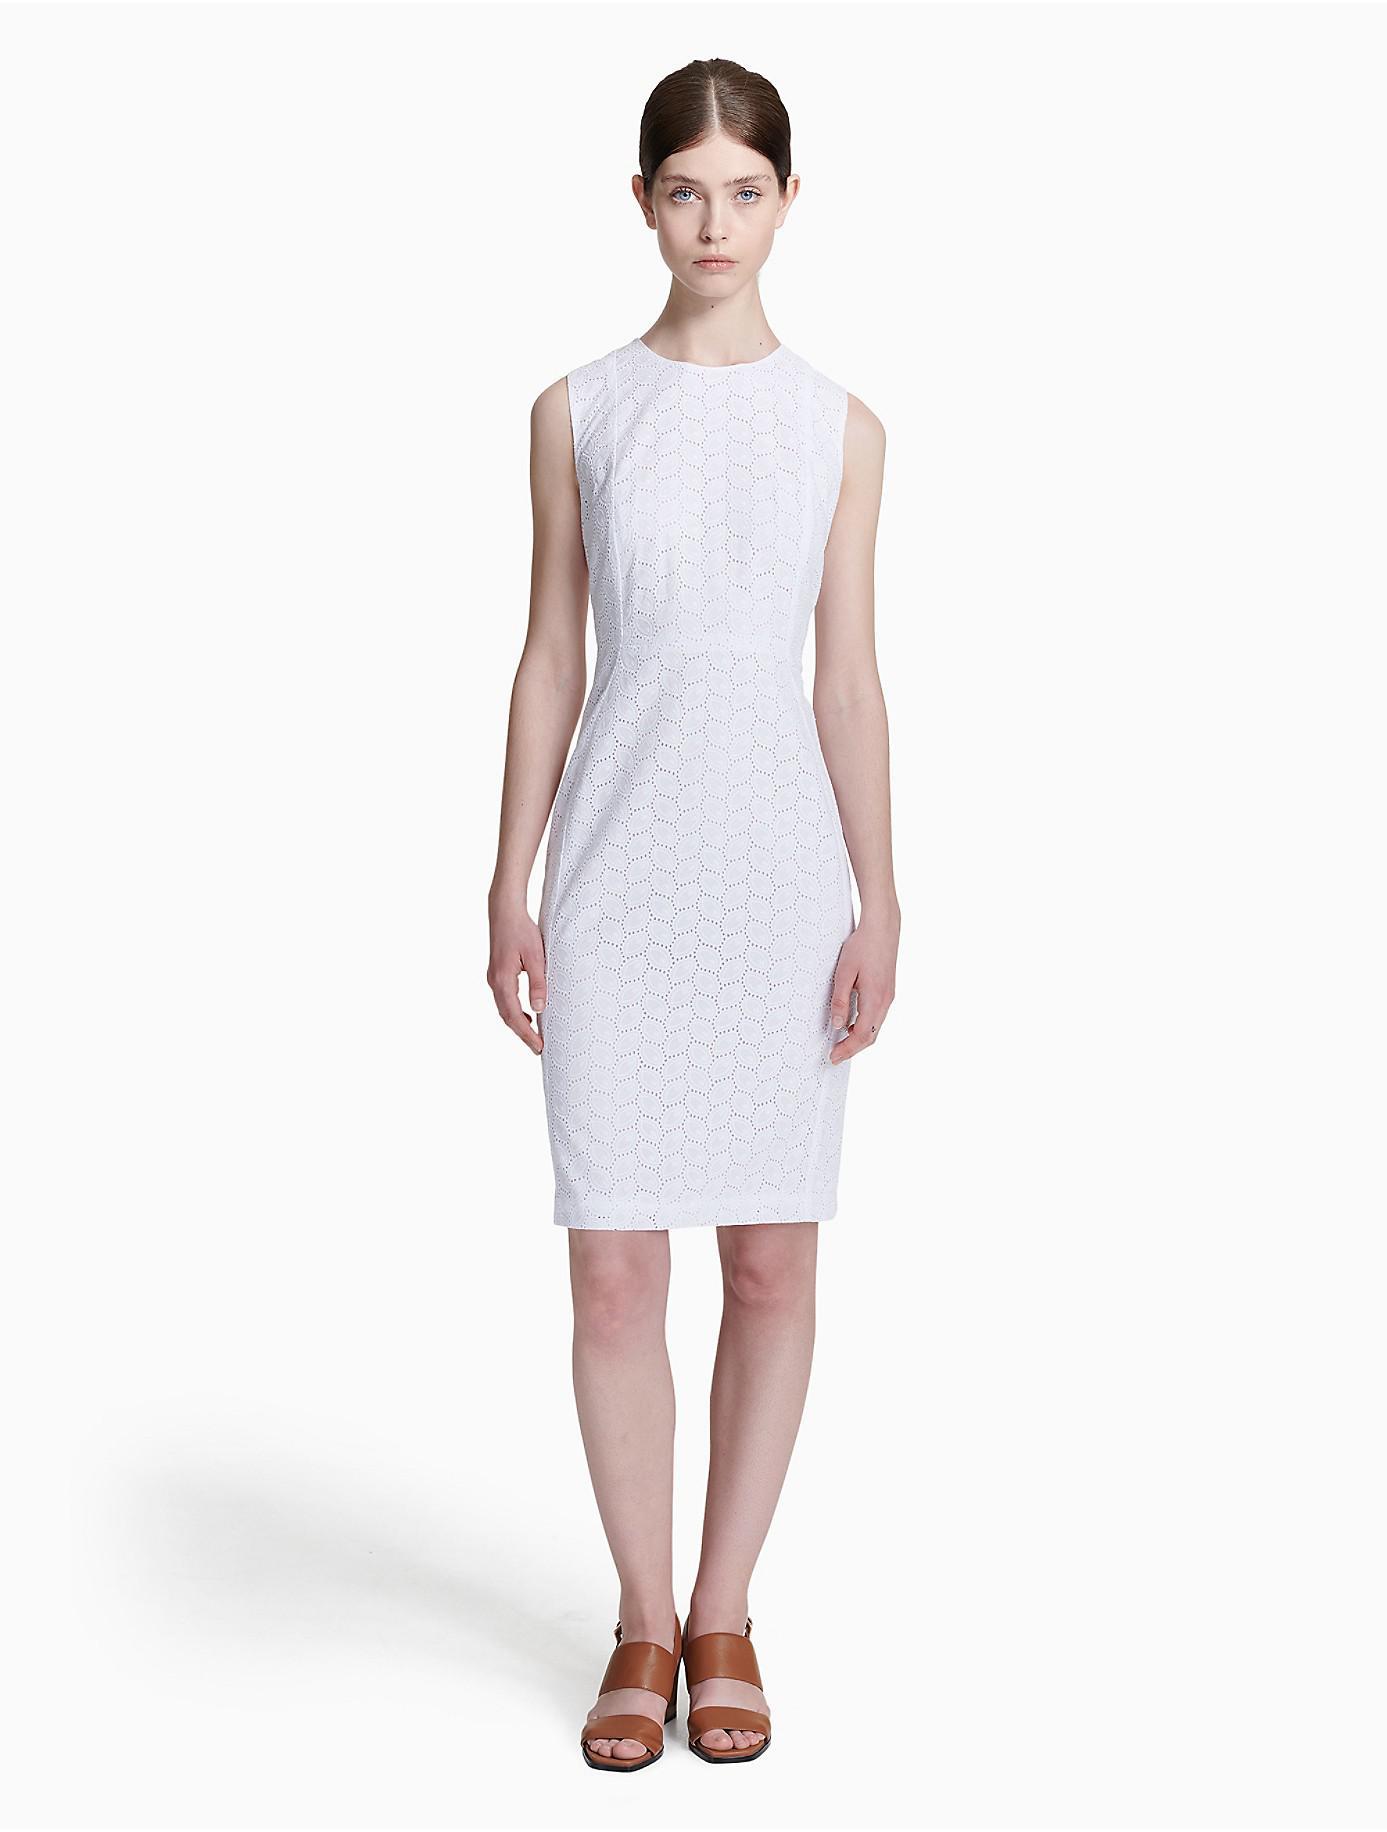 White Cotton Sheath